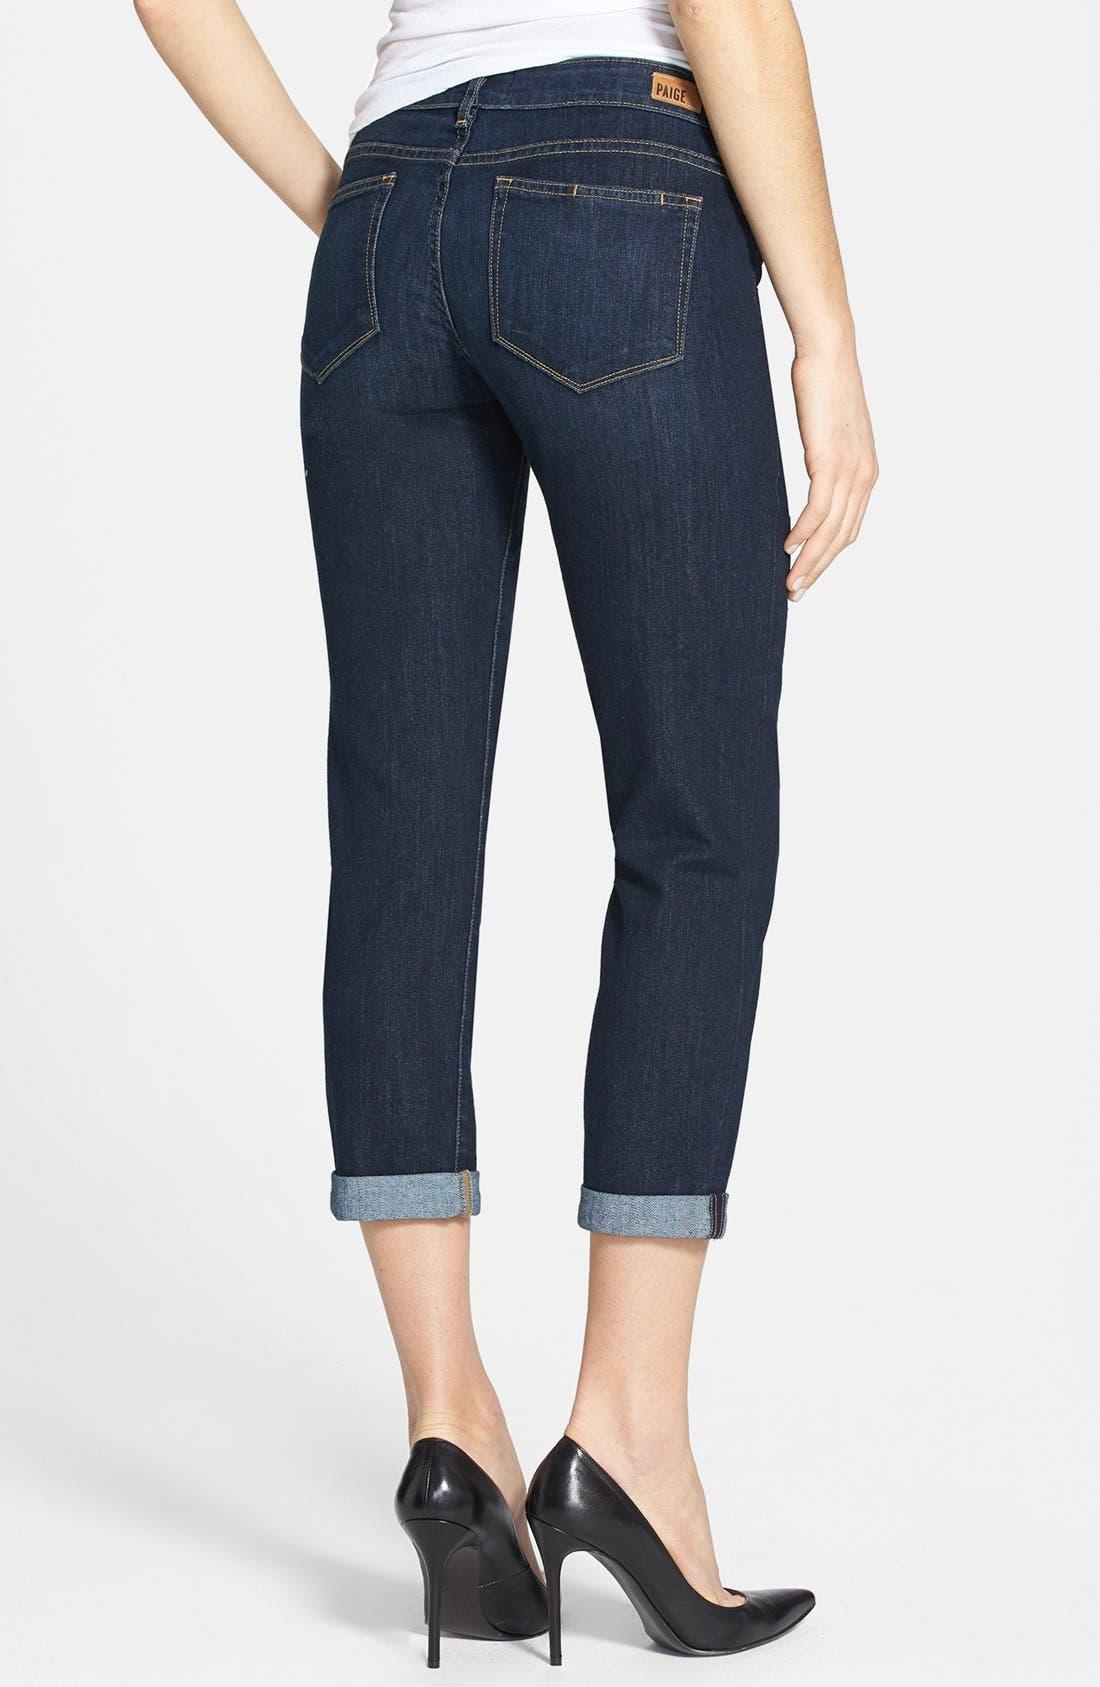 Alternate Image 2  - Paige Denim 'Jimmy Jimmy' Crop Skinny Jeans (Highland)